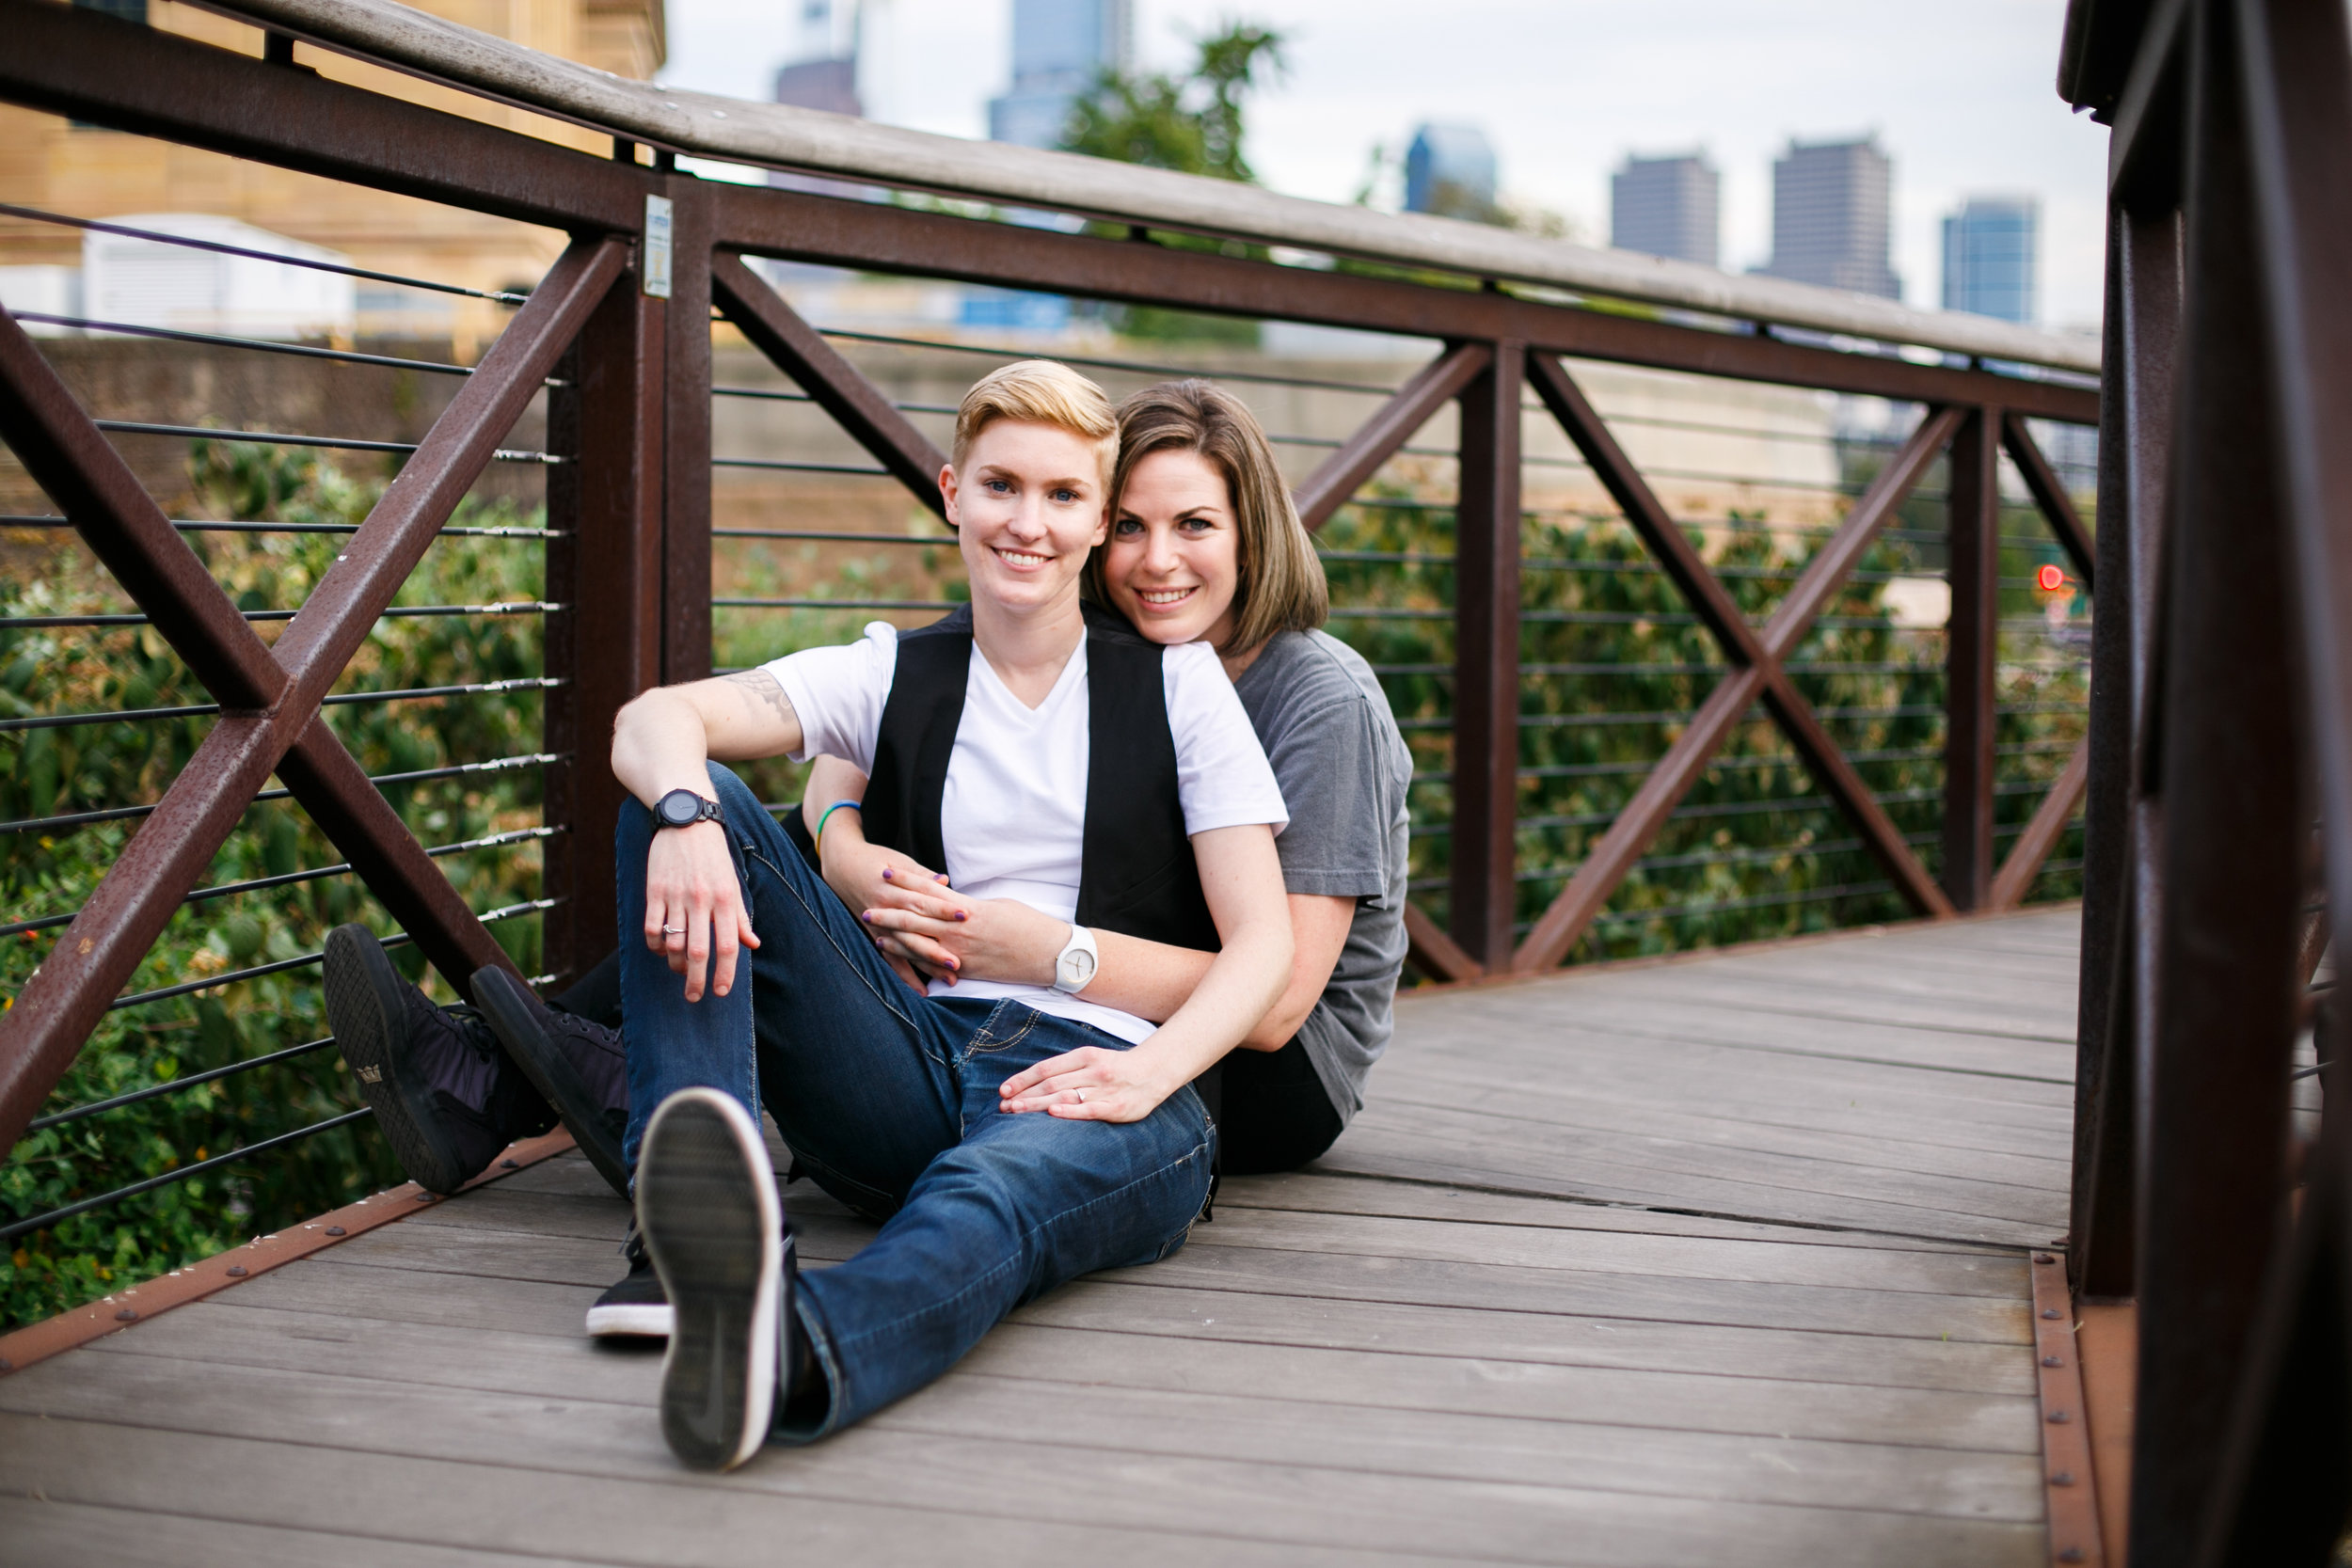 Philadelphia Queer Engagement Session by Lesbian Photographer Amanda Swiger 15